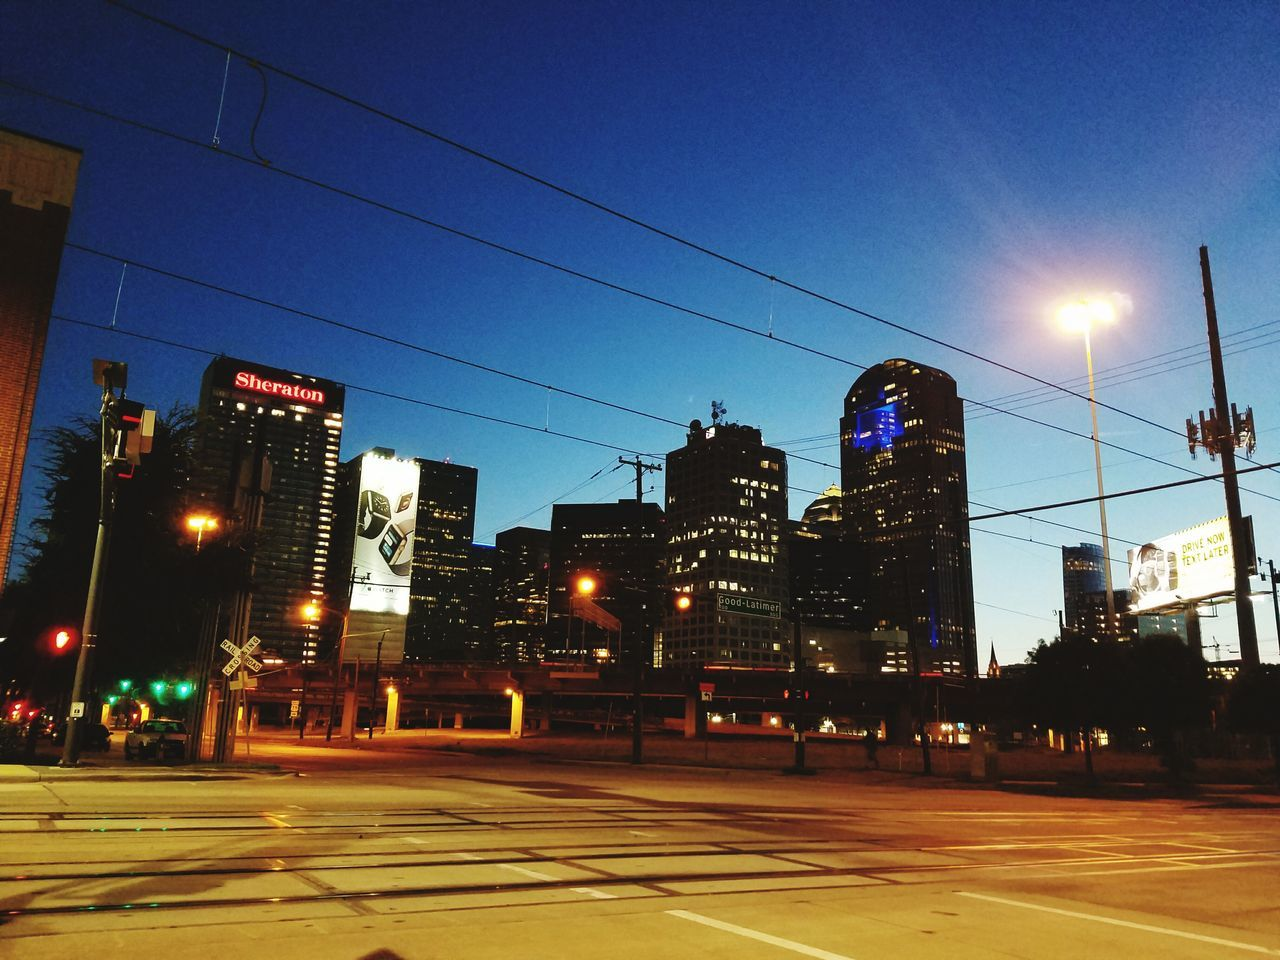 Downtown Dallas Taking Photos Enjoying Life City Skyline Photo Of The Day Dallas Tx Architecture